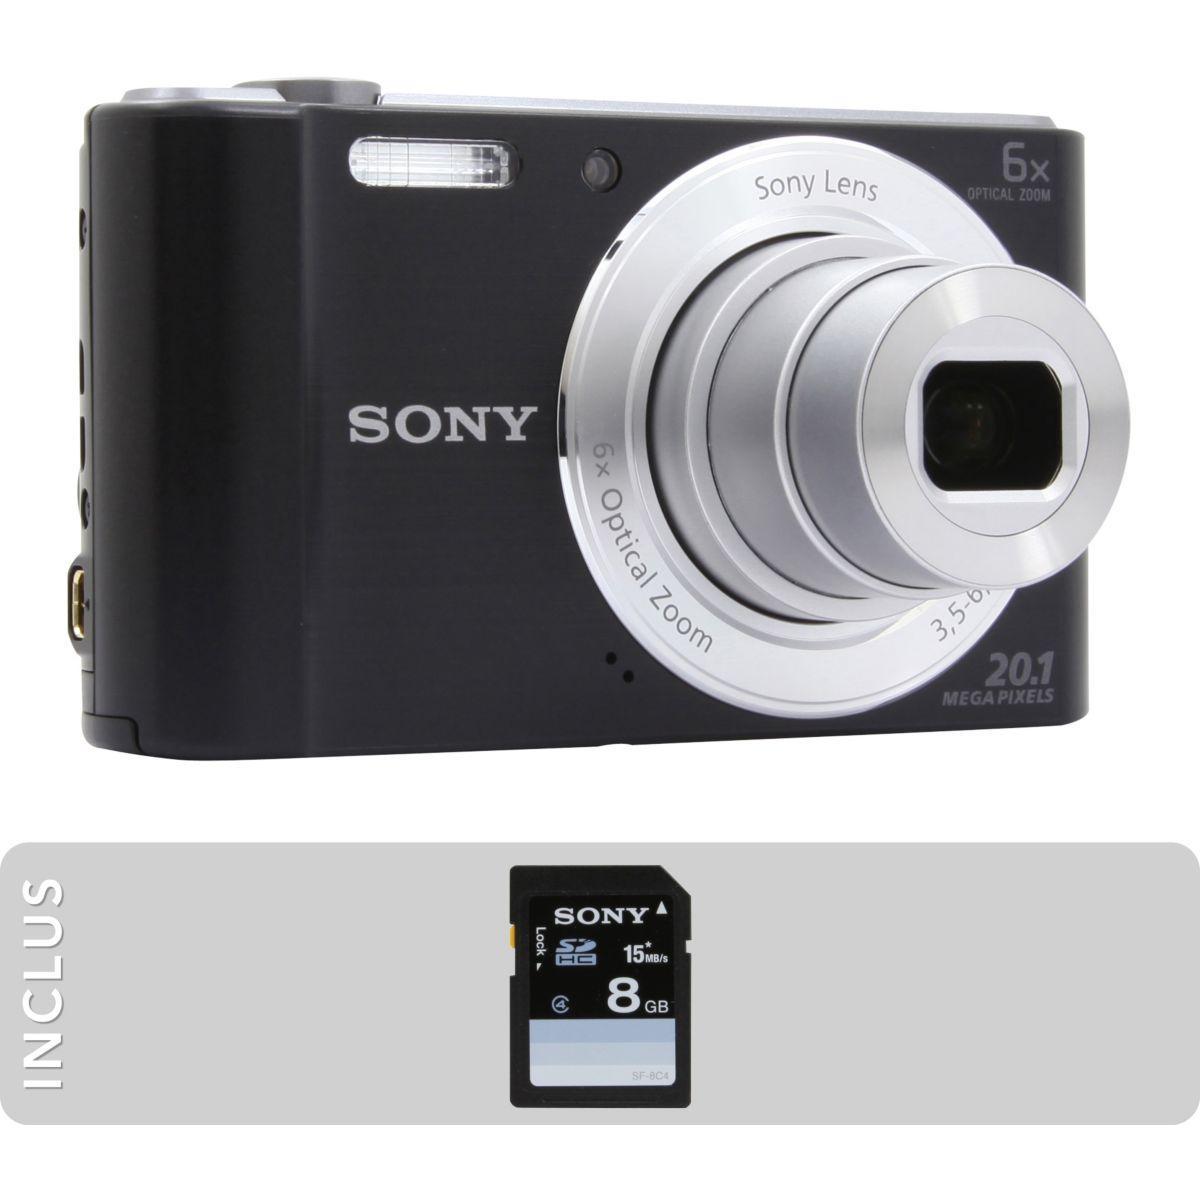 Appareil photo compact sony pack dsc-w810 noir + sd 8go - livraison offerte : code livphoto (photo)